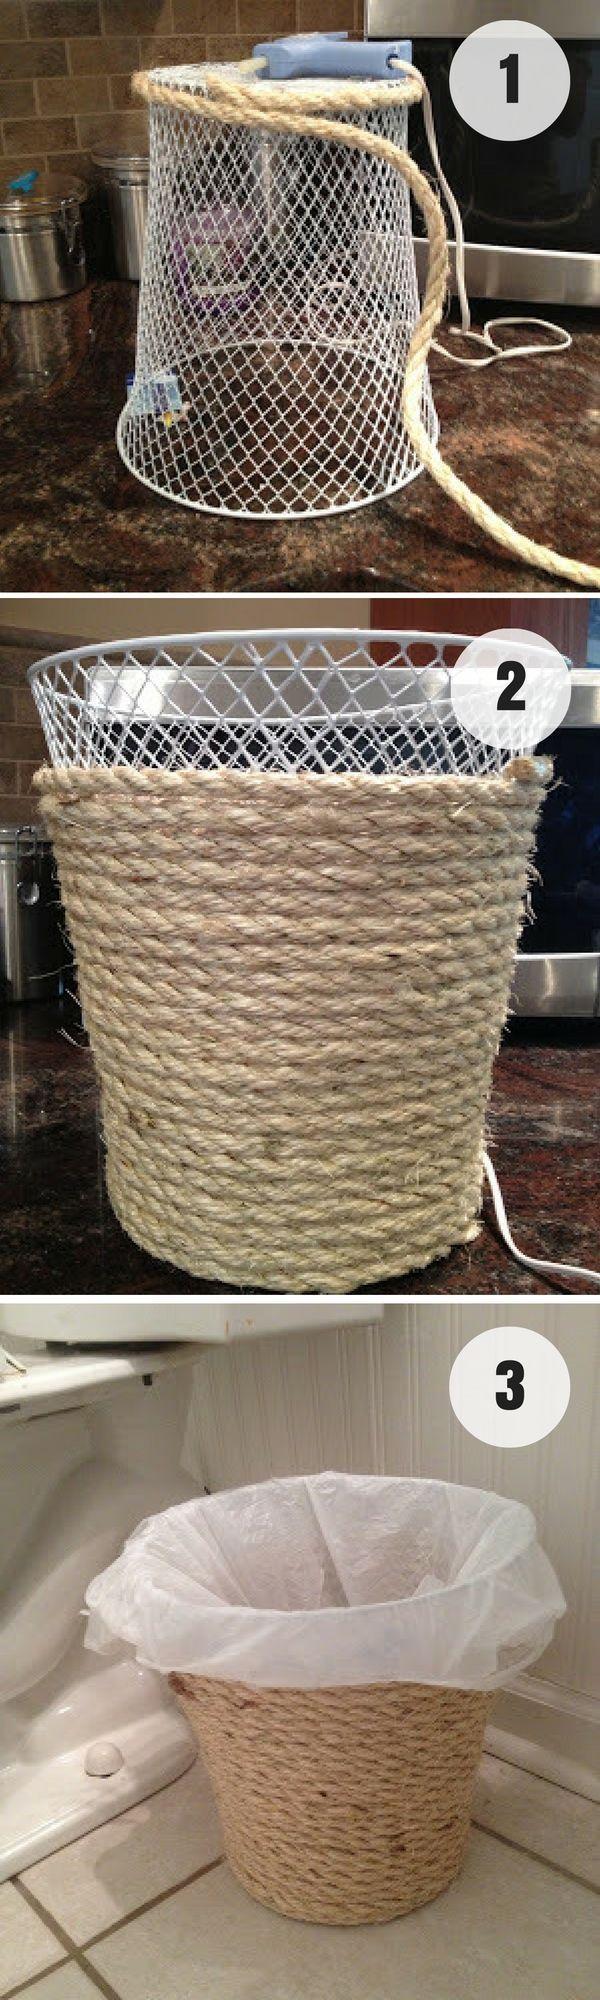 Easy to make DIY Rope Trash Can for rustic bathroom decor /istandarddesign/